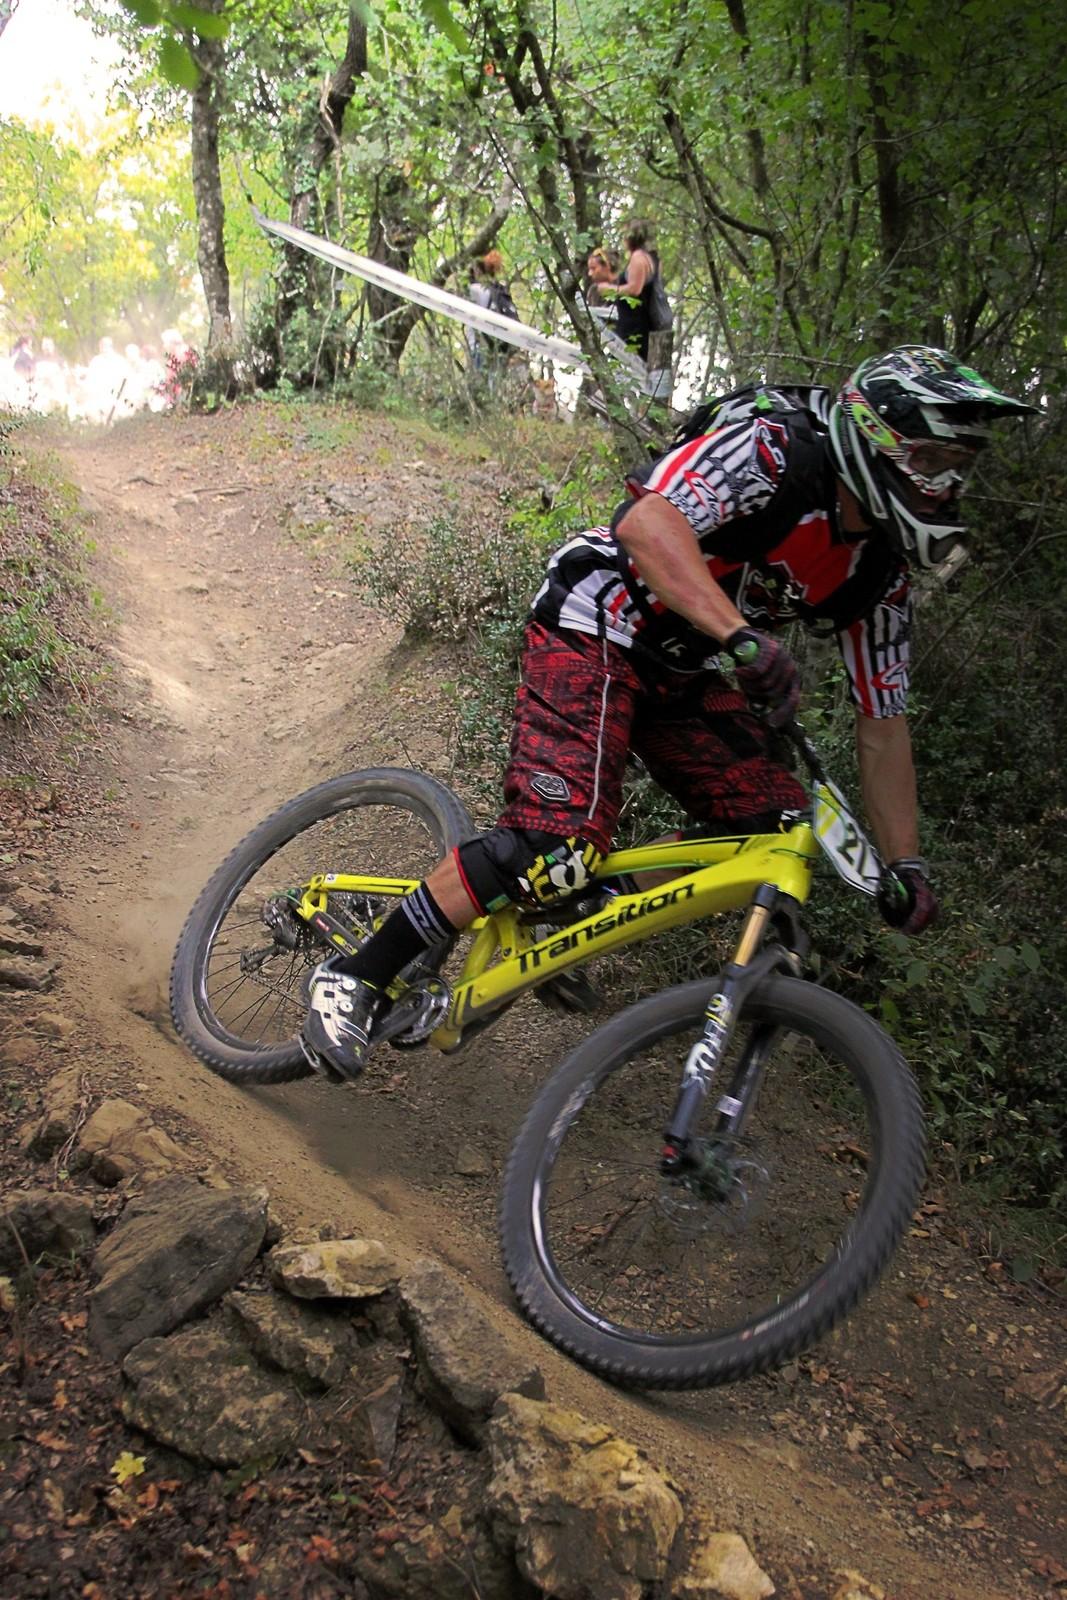 Super Enduro Tolfa 04 - Ruggero - Mountain Biking Pictures - Vital MTB